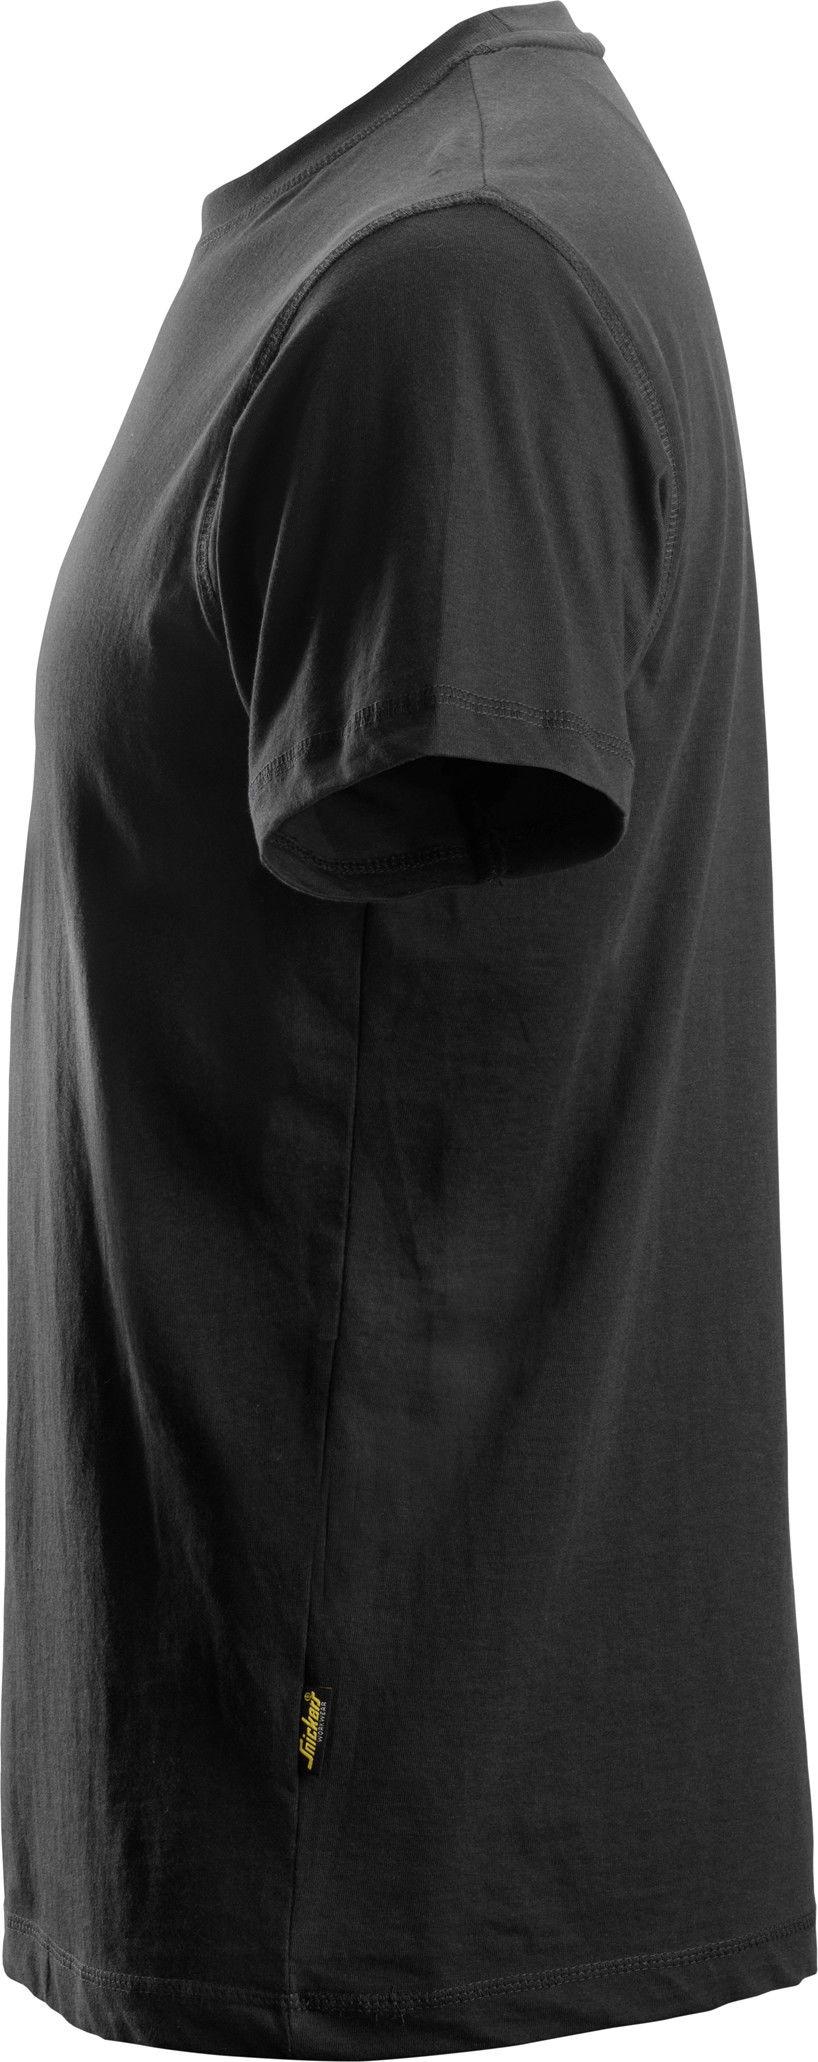 T-shirt koszulka męska, czarna, rozmiar M, 2502 Snickers [25020400005]